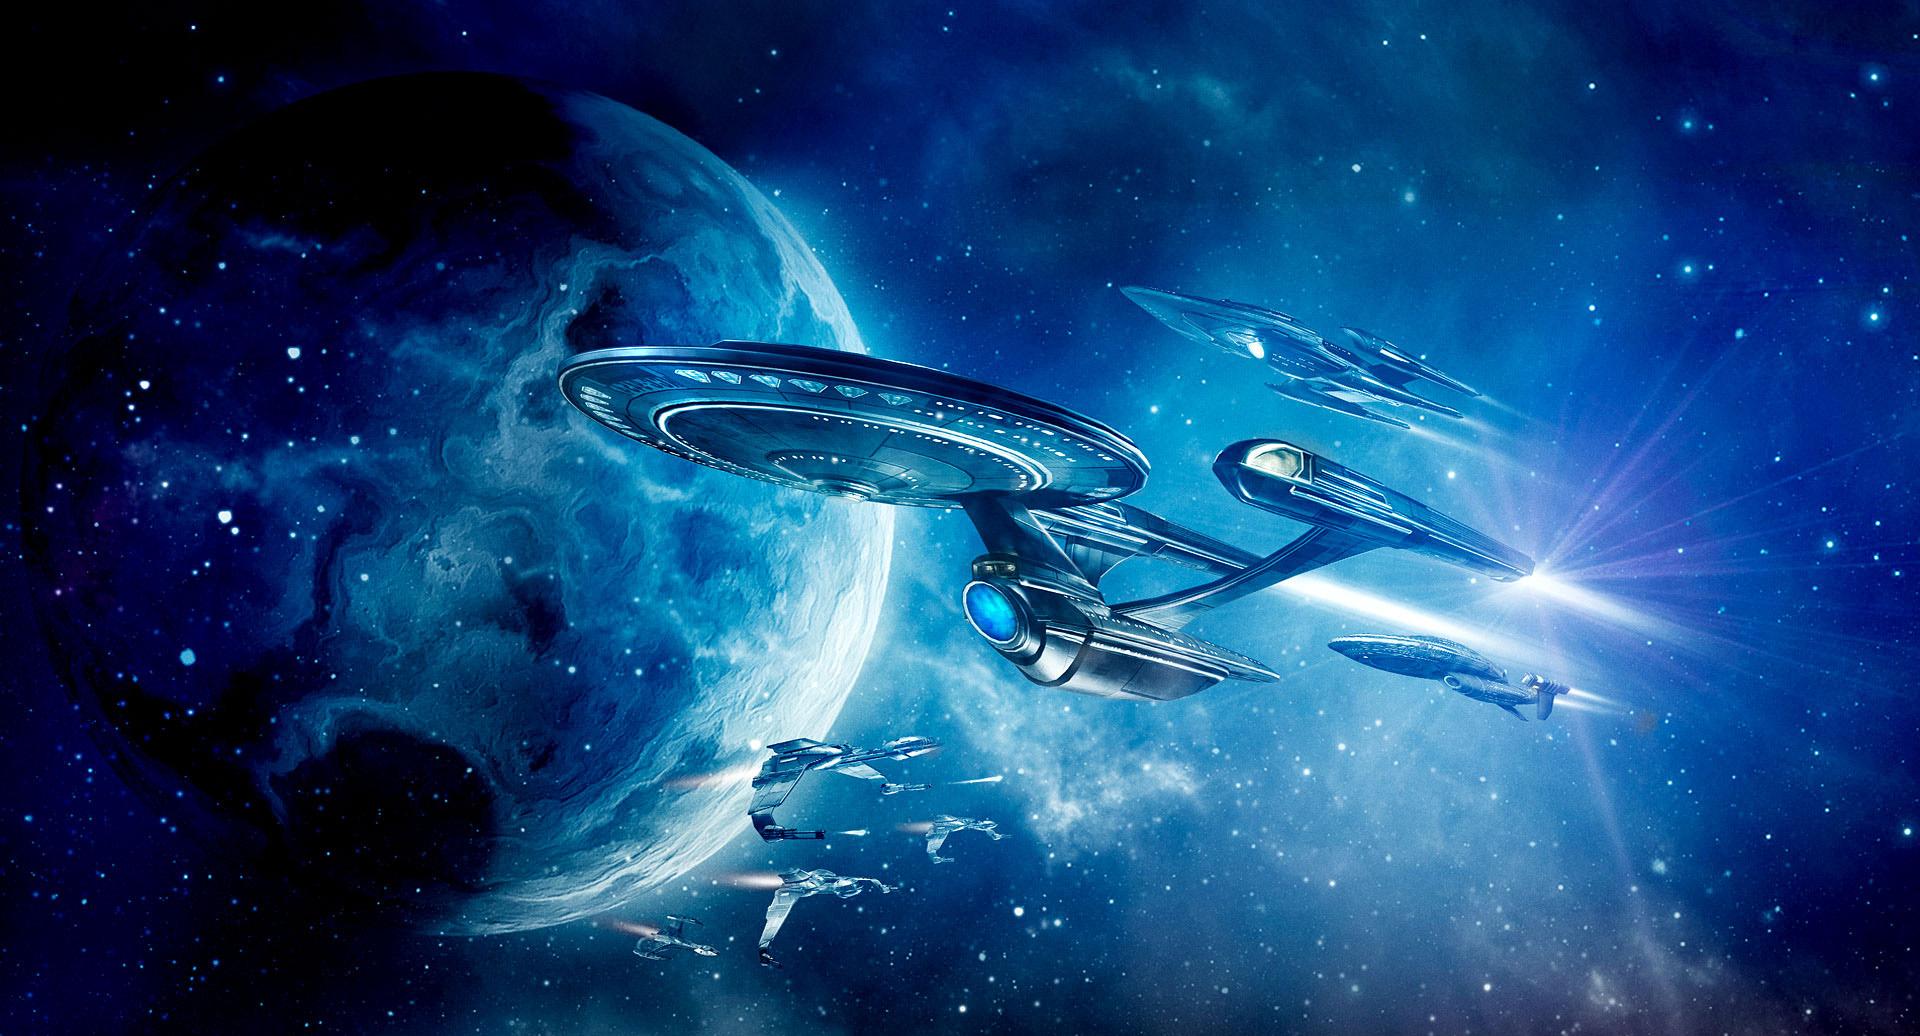 Star Trek HD Wallpapers 1920x1036